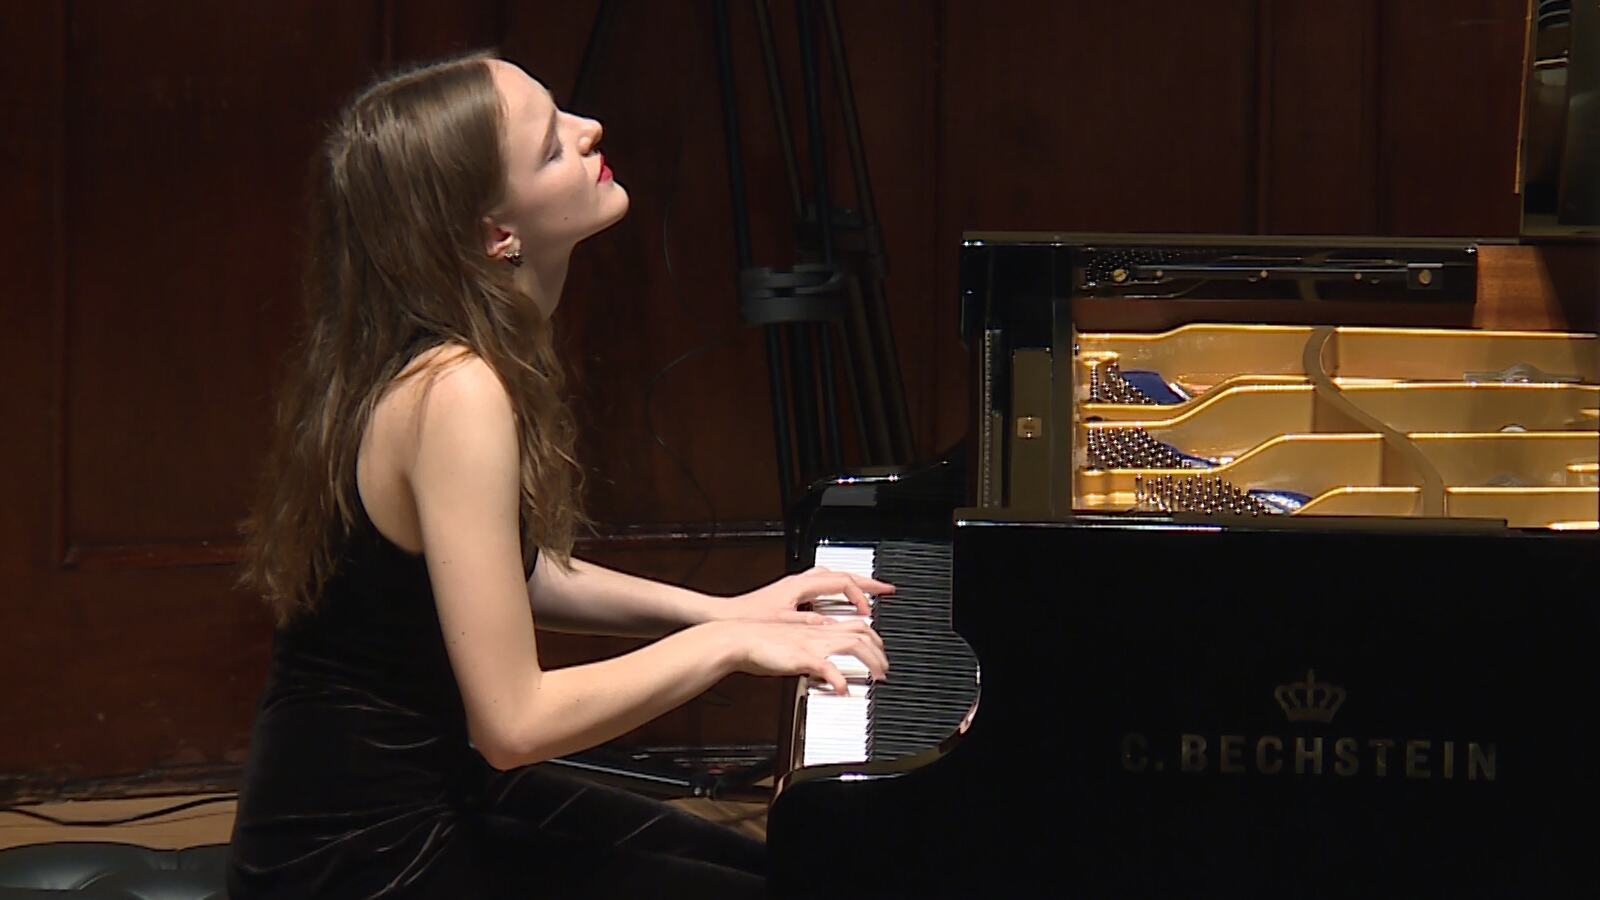 A women playing the piano